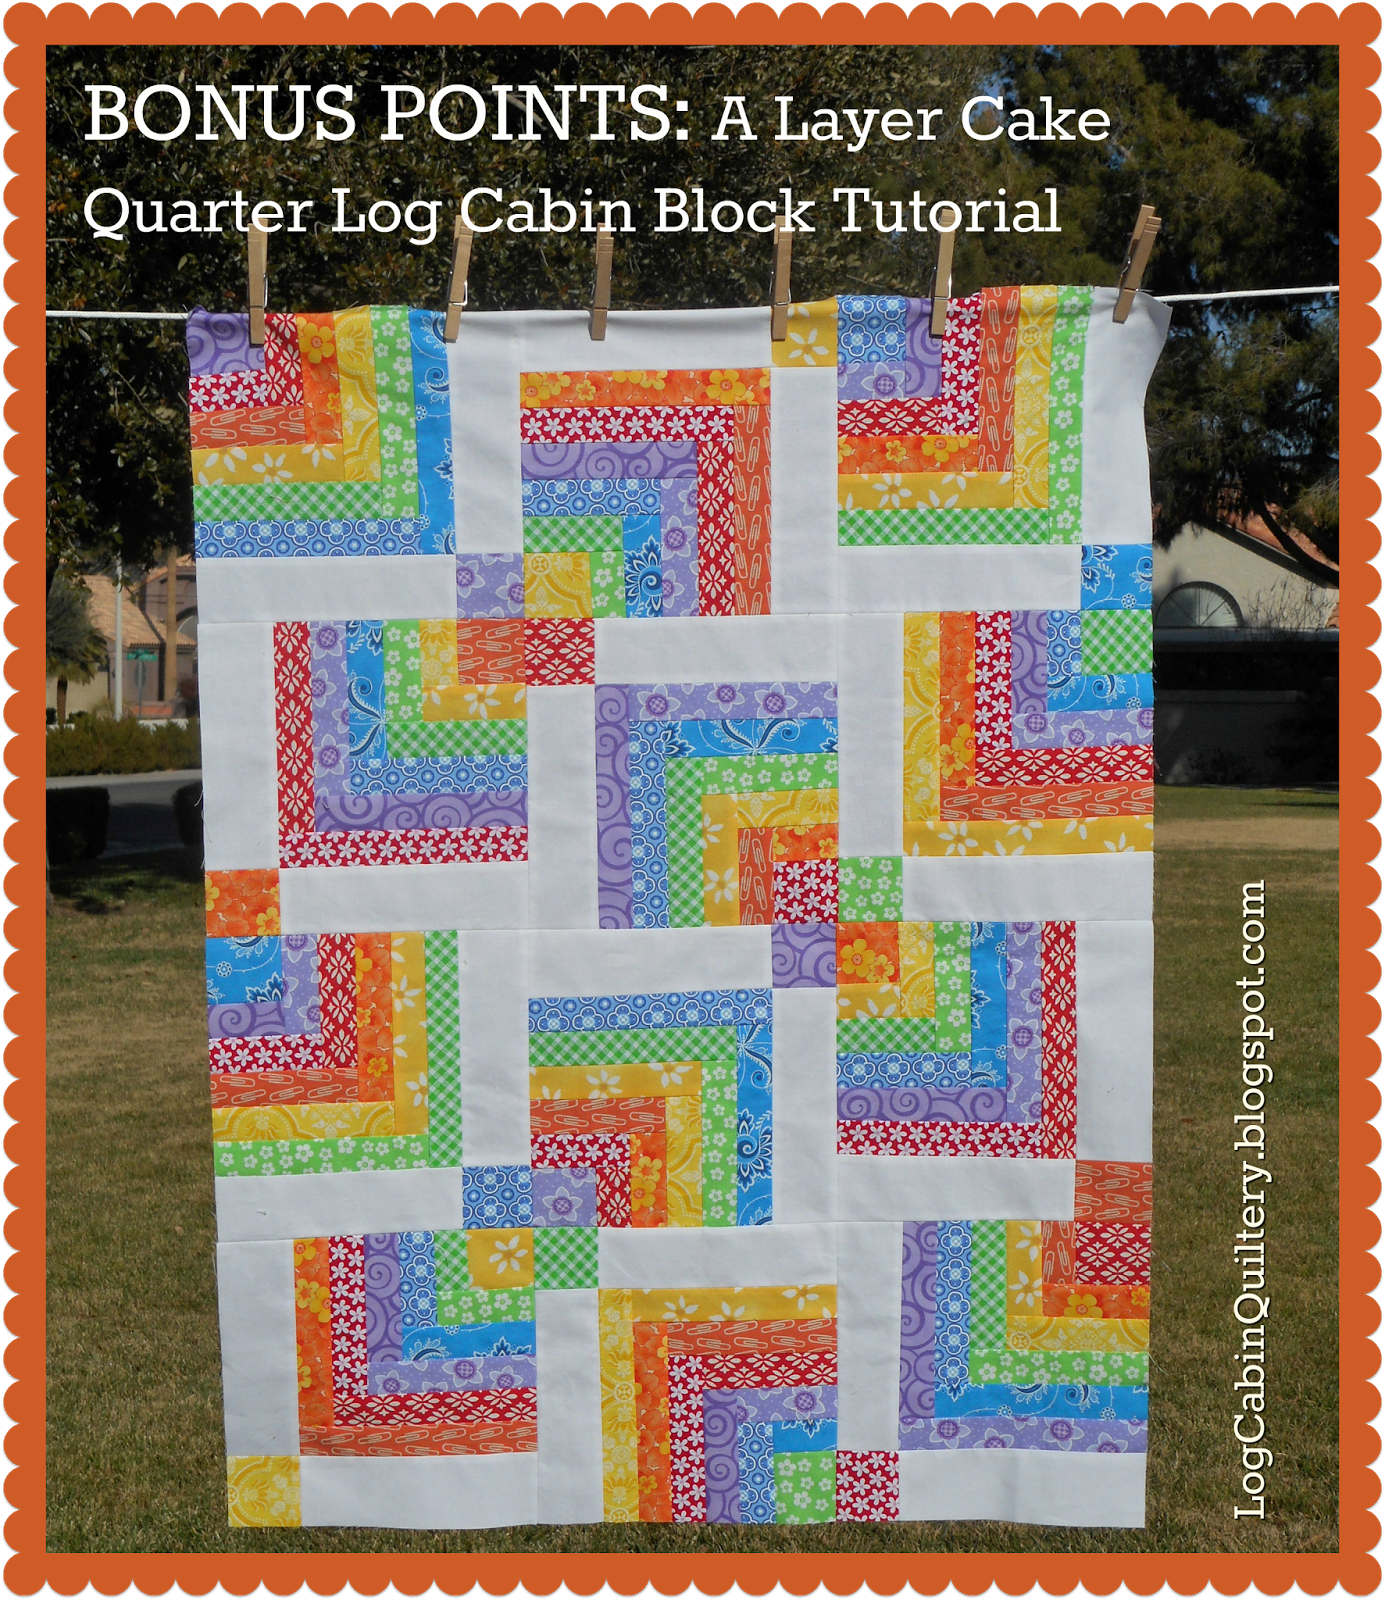 bonus points: a layer cake quarter log cabin block tutorial